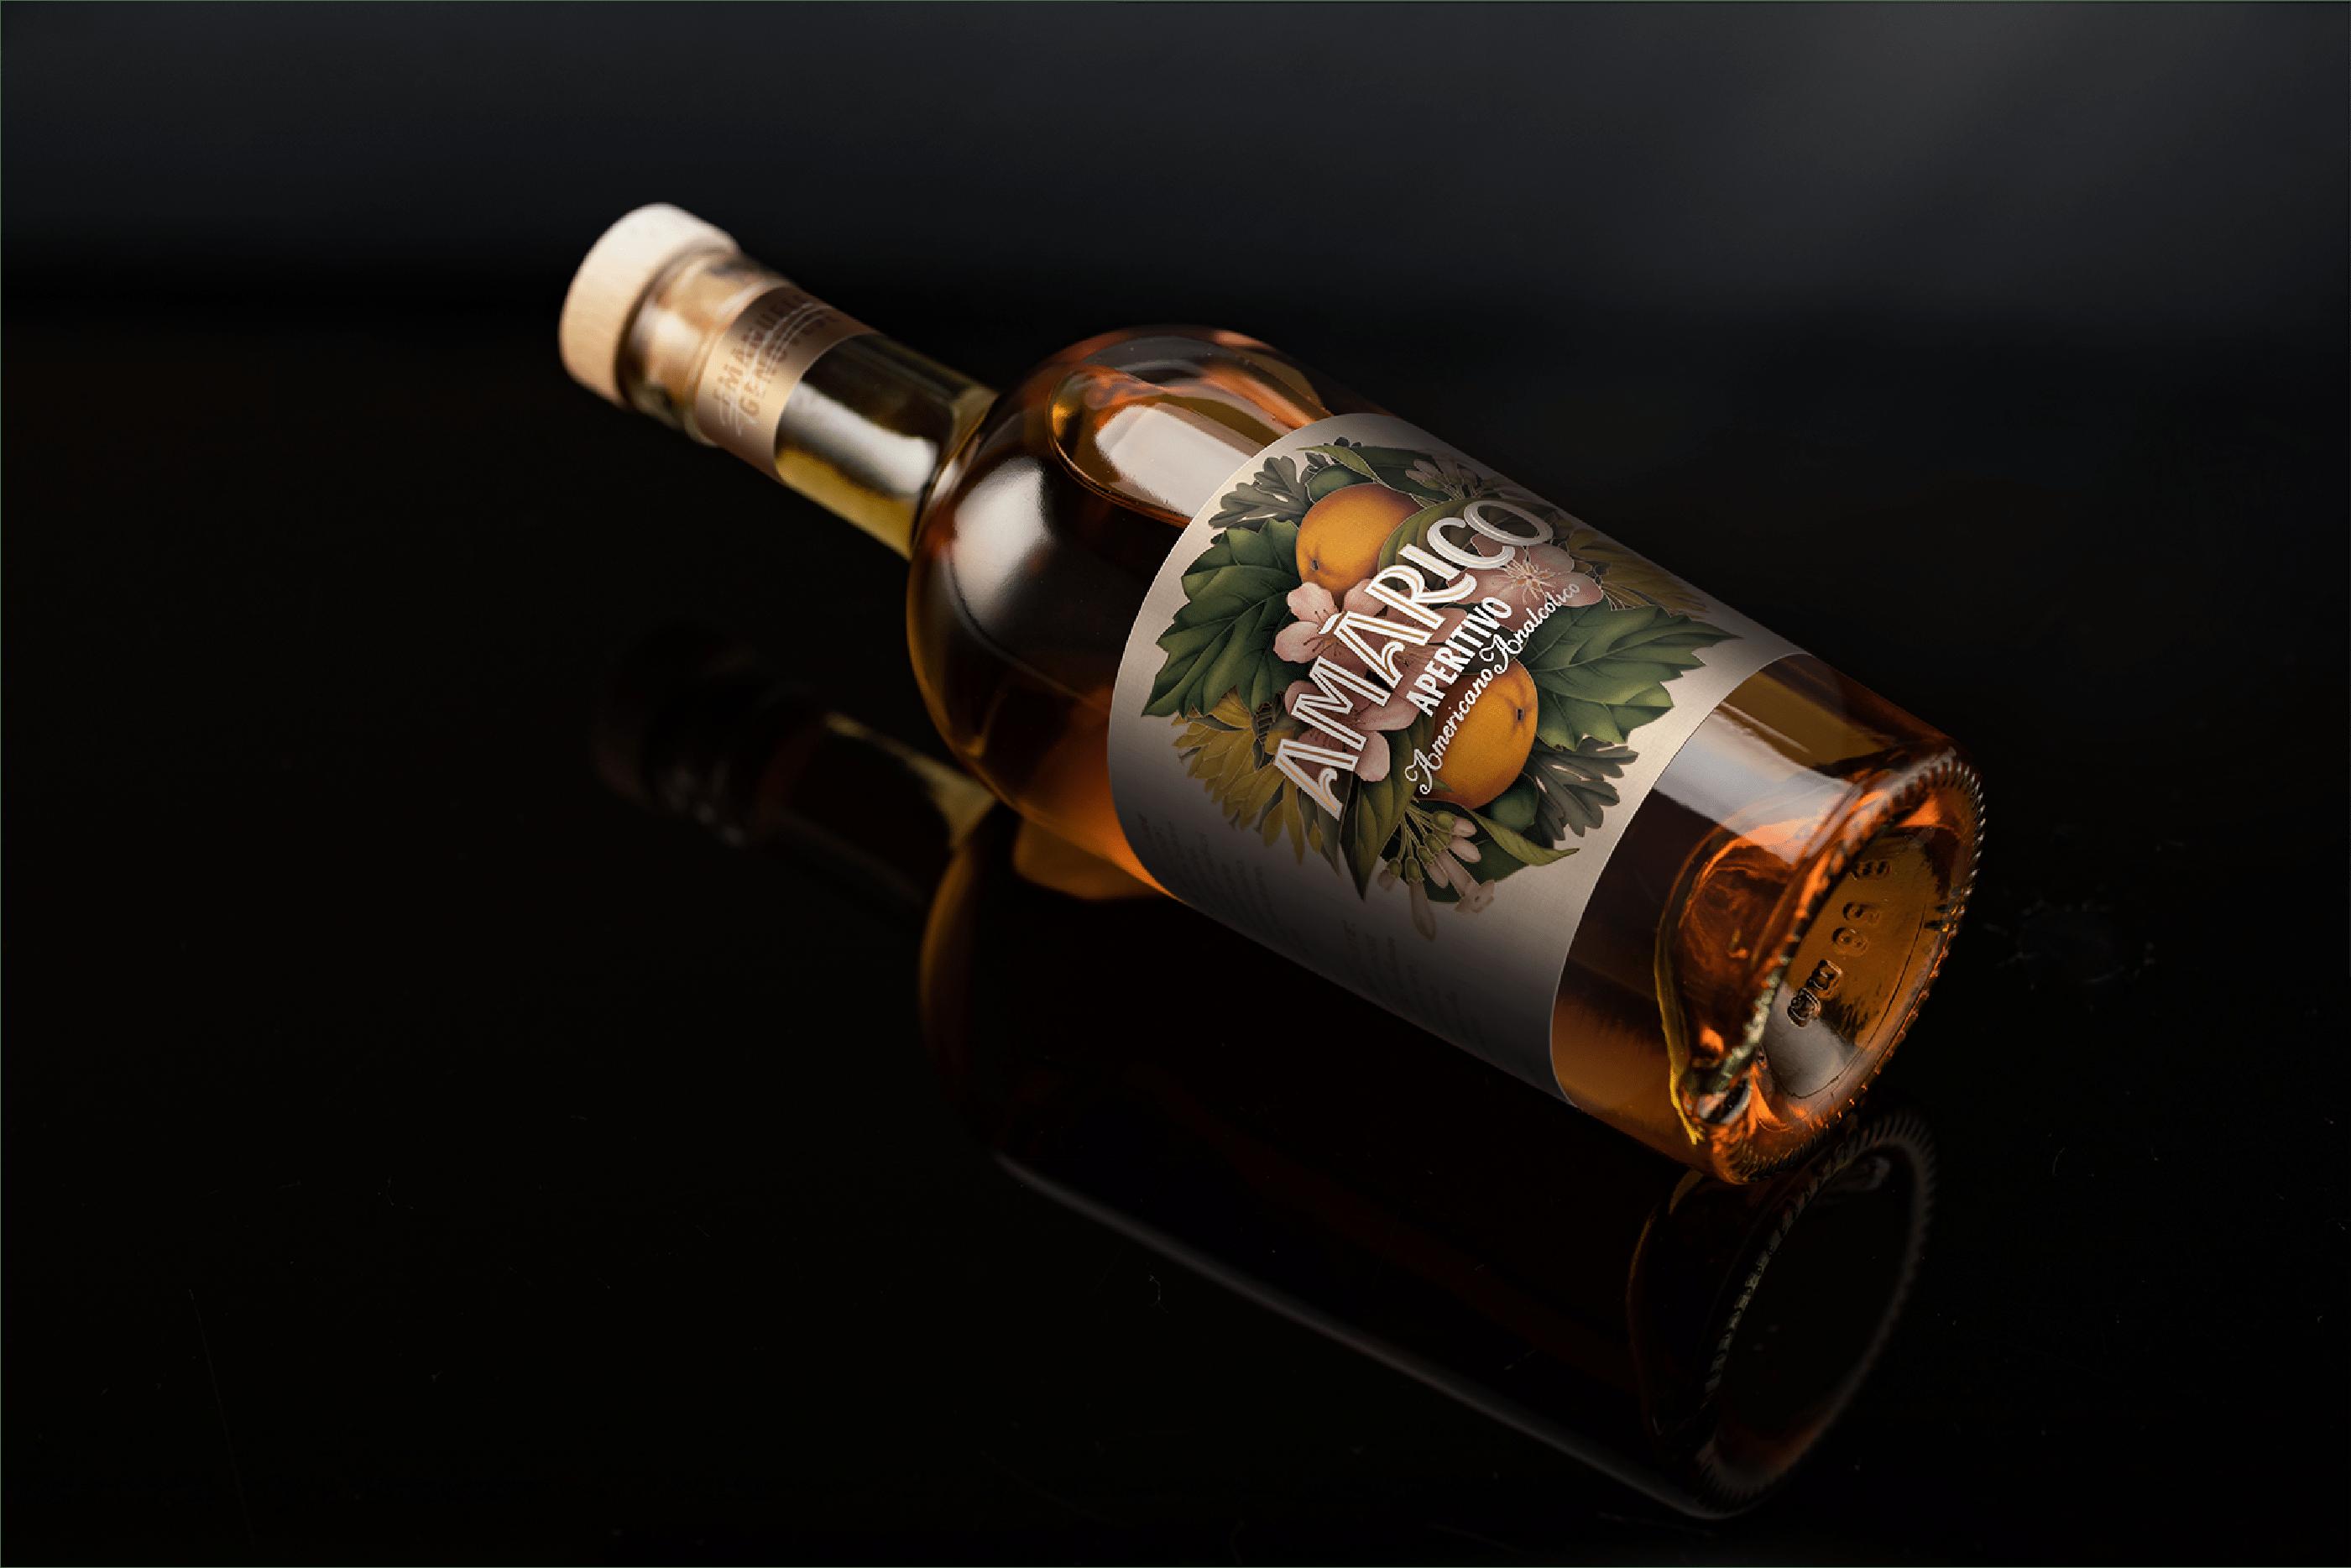 Amarico – Sip the Italian Dolce Vita